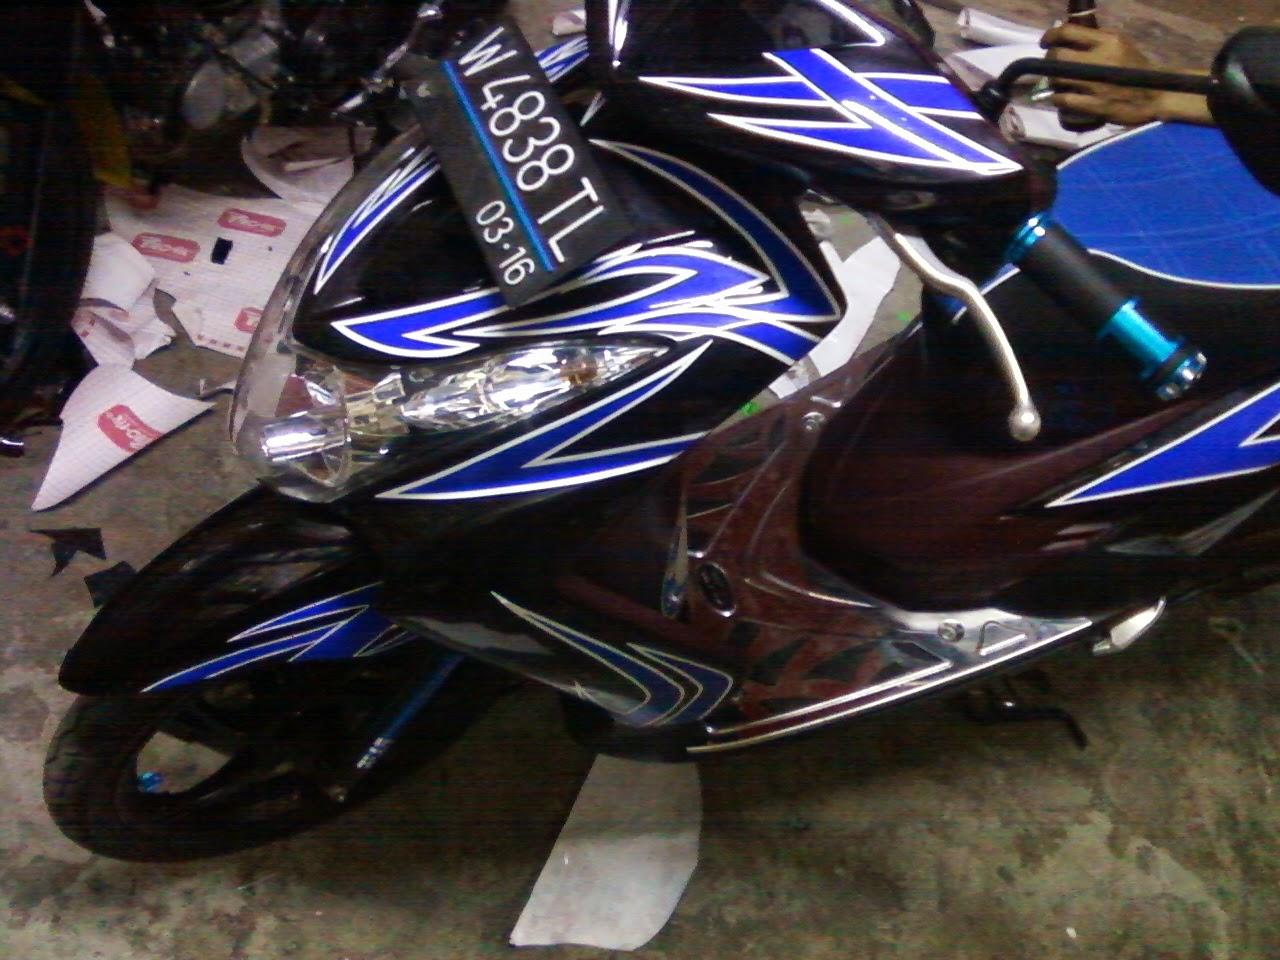 Modifikasi Motor Yamaha 2016: Modifikasi Stiker Motor Mio ...